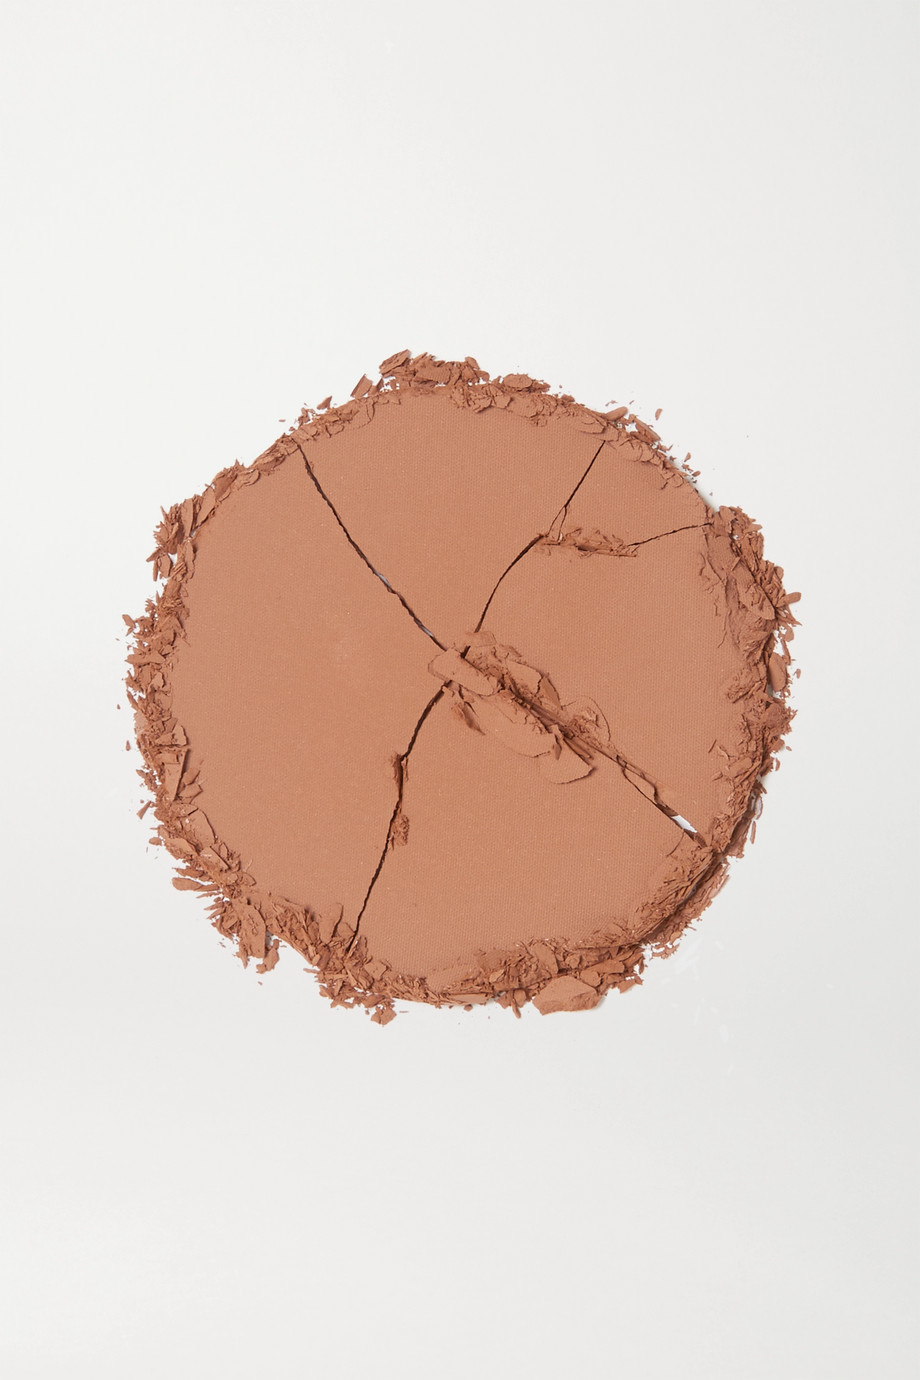 Charlotte Tilbury Airbrush Bronzer Refill - 2 Medium